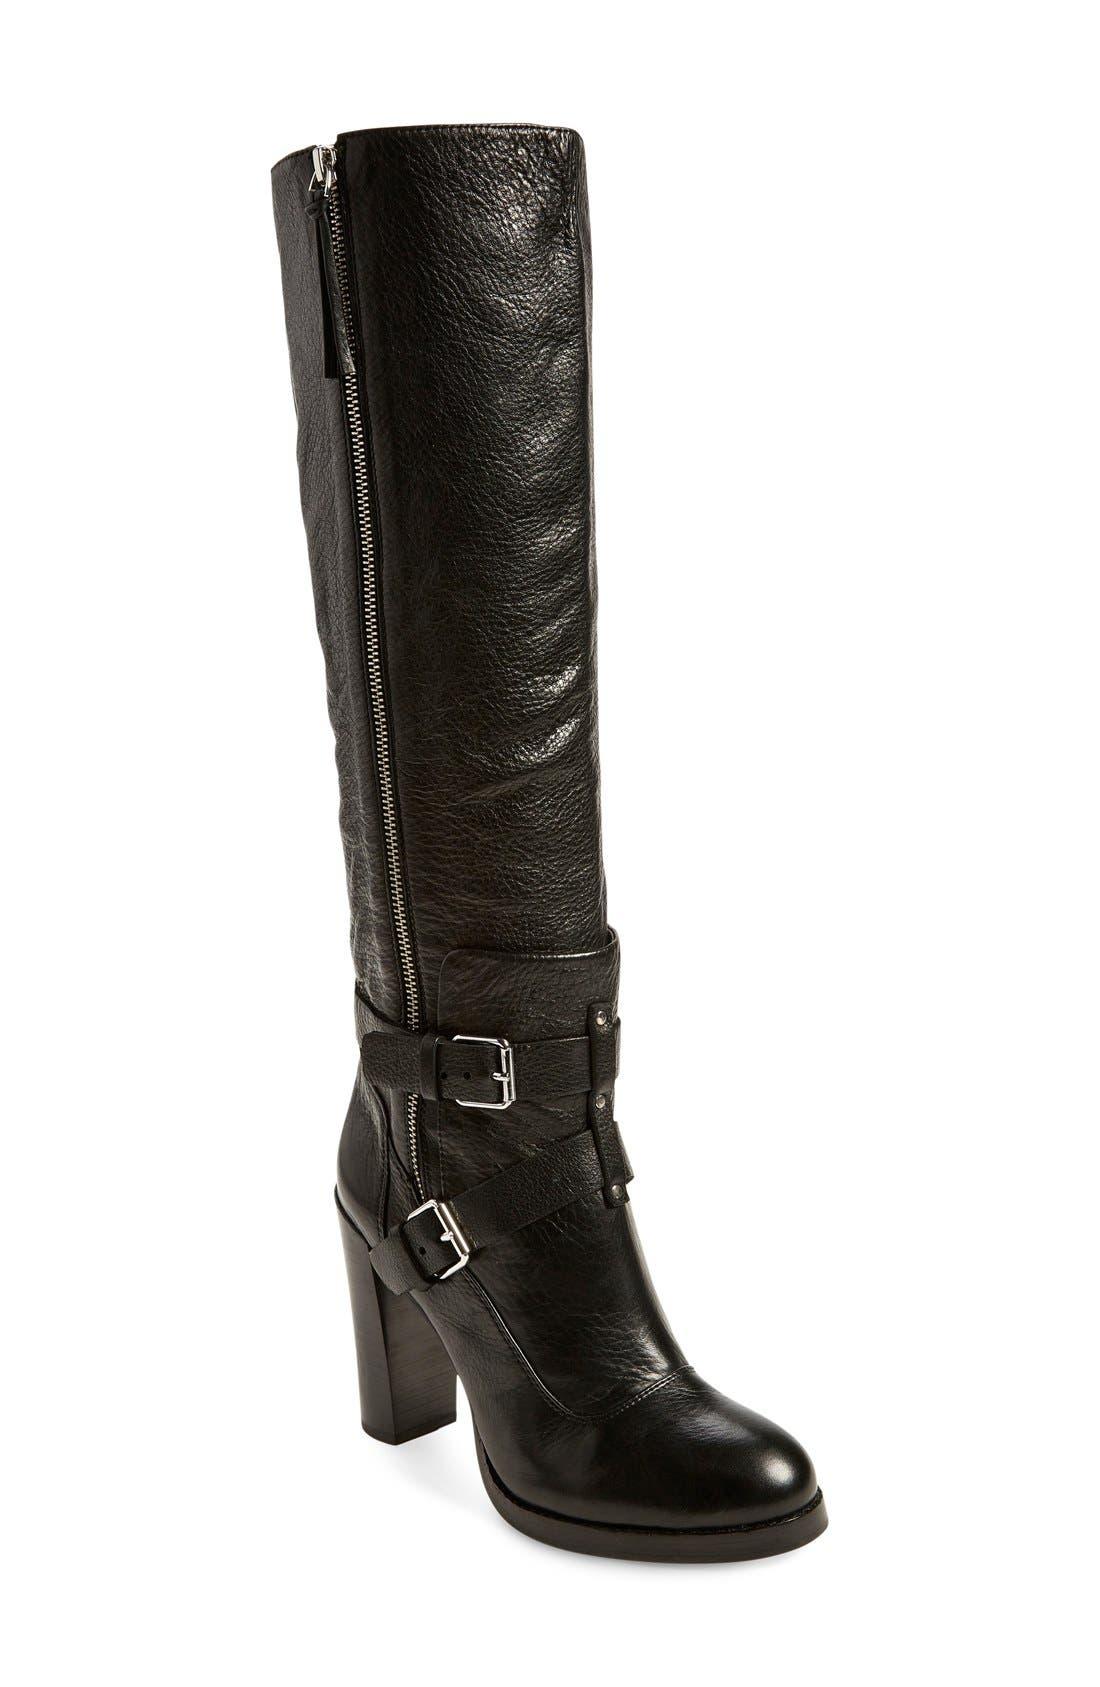 'Billie' Knee-High Boot, Main, color, 001